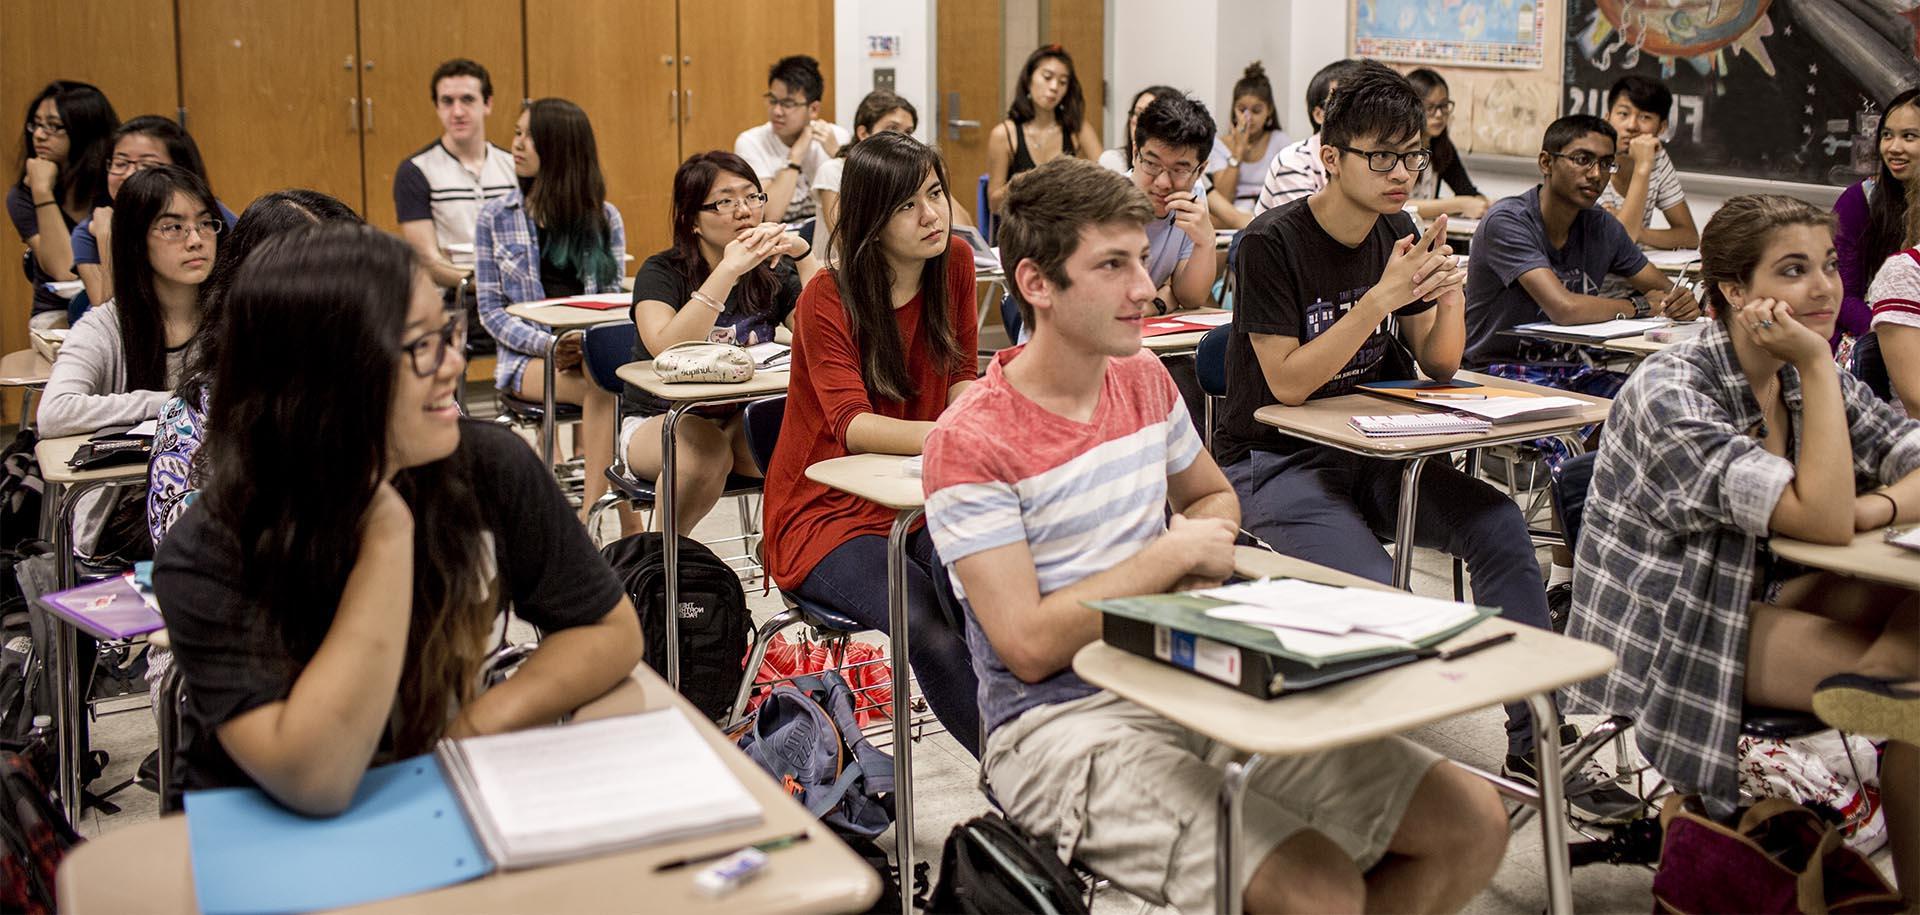 High Schools Students in a classroom